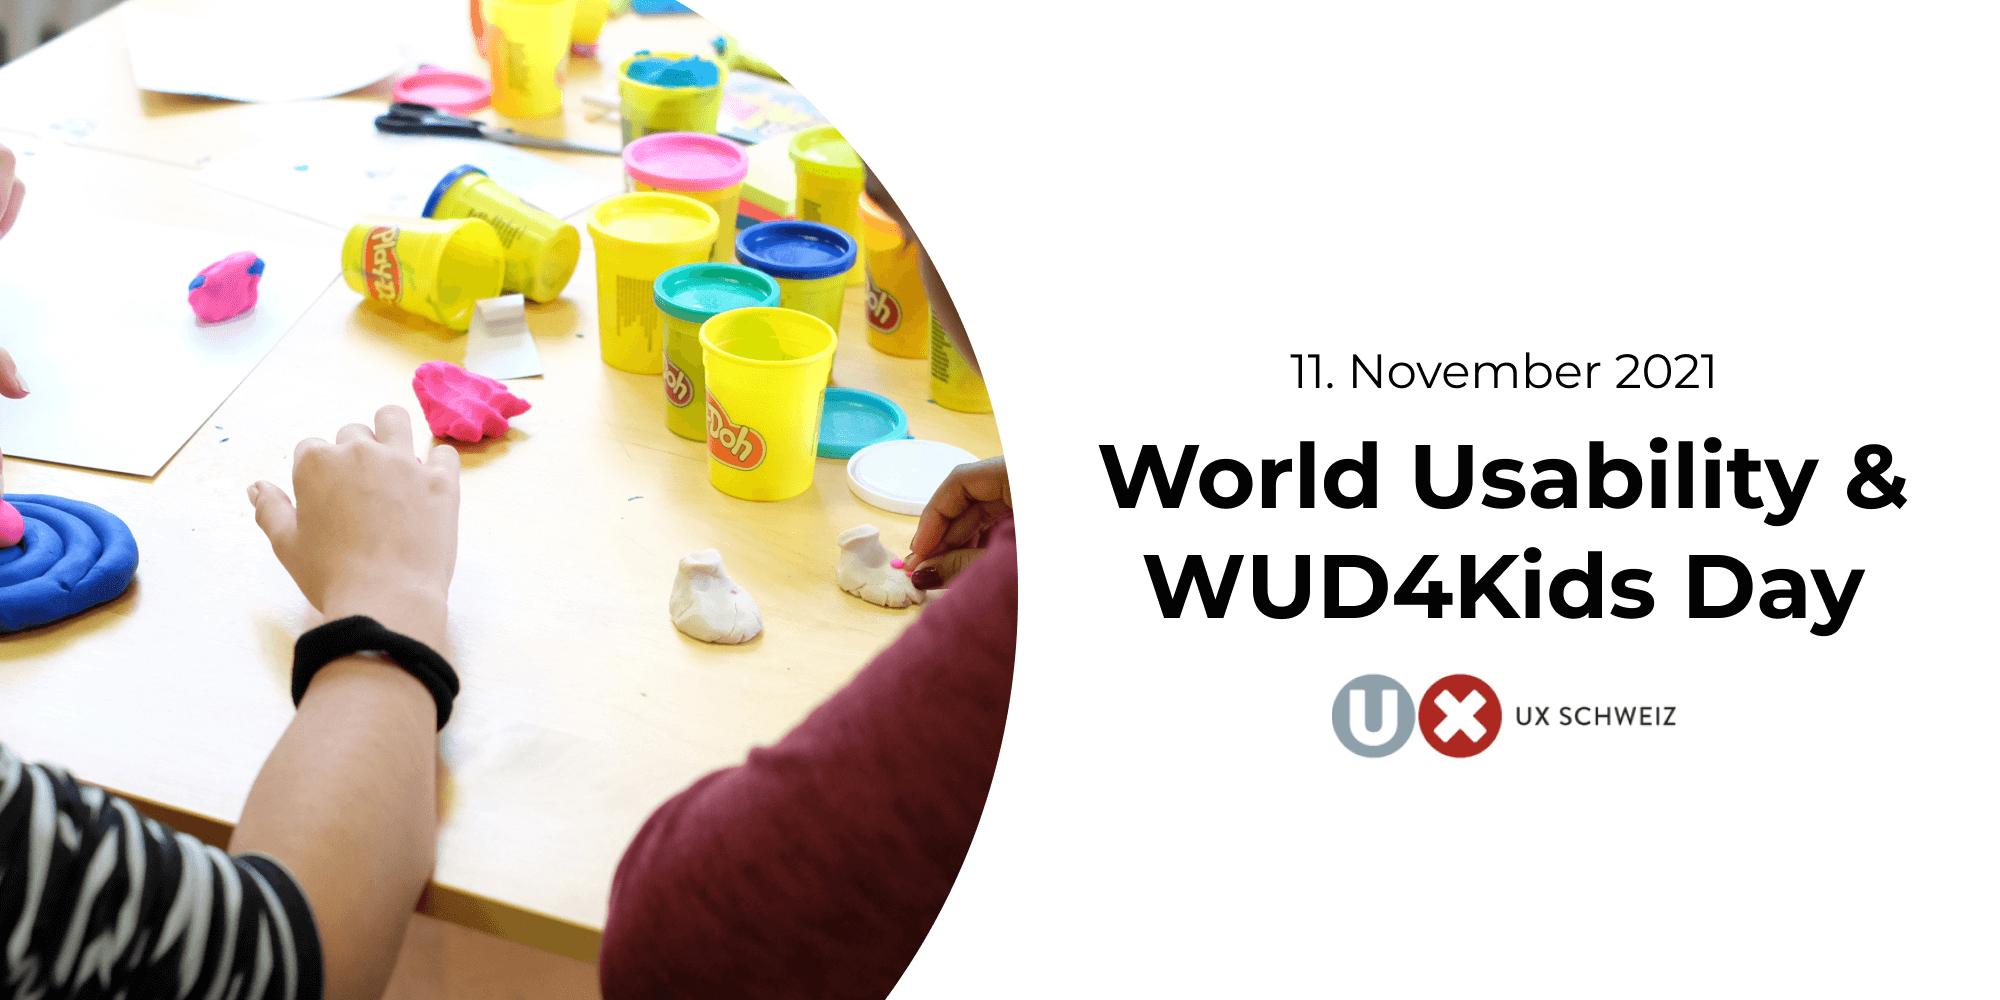 World Usability & WUD4Kids Day 2021